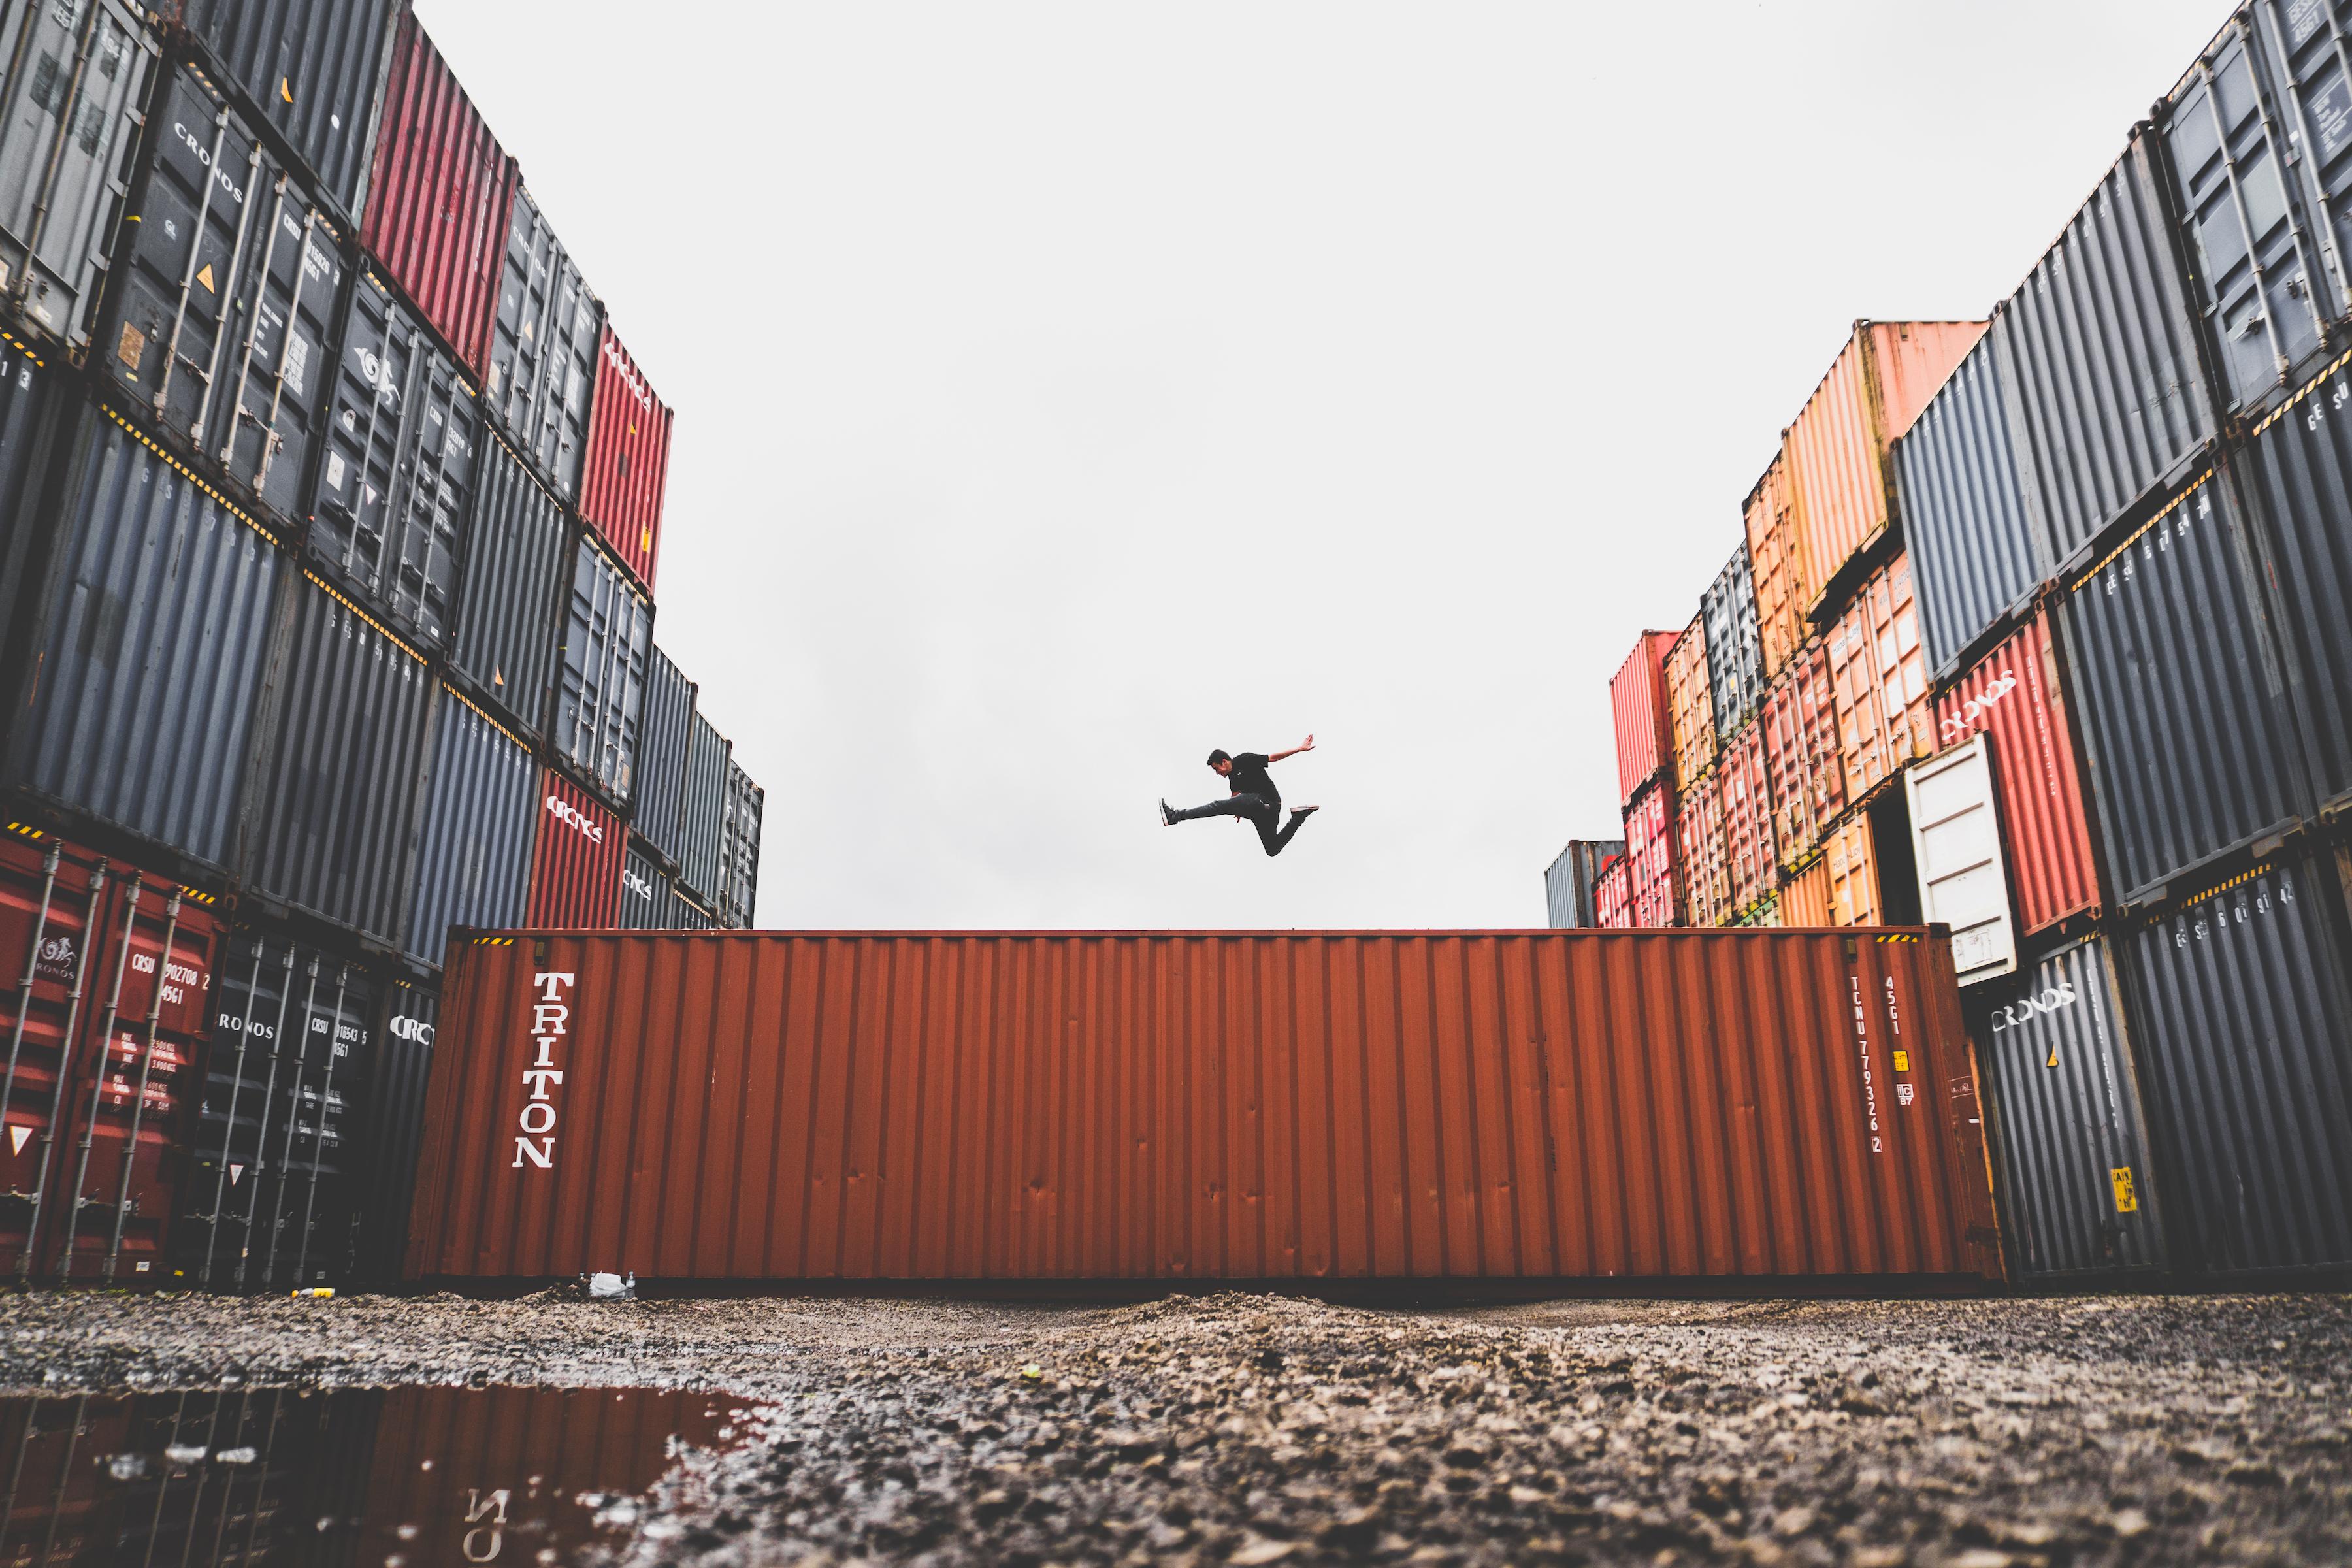 Why Choose a Logistics Career Path?